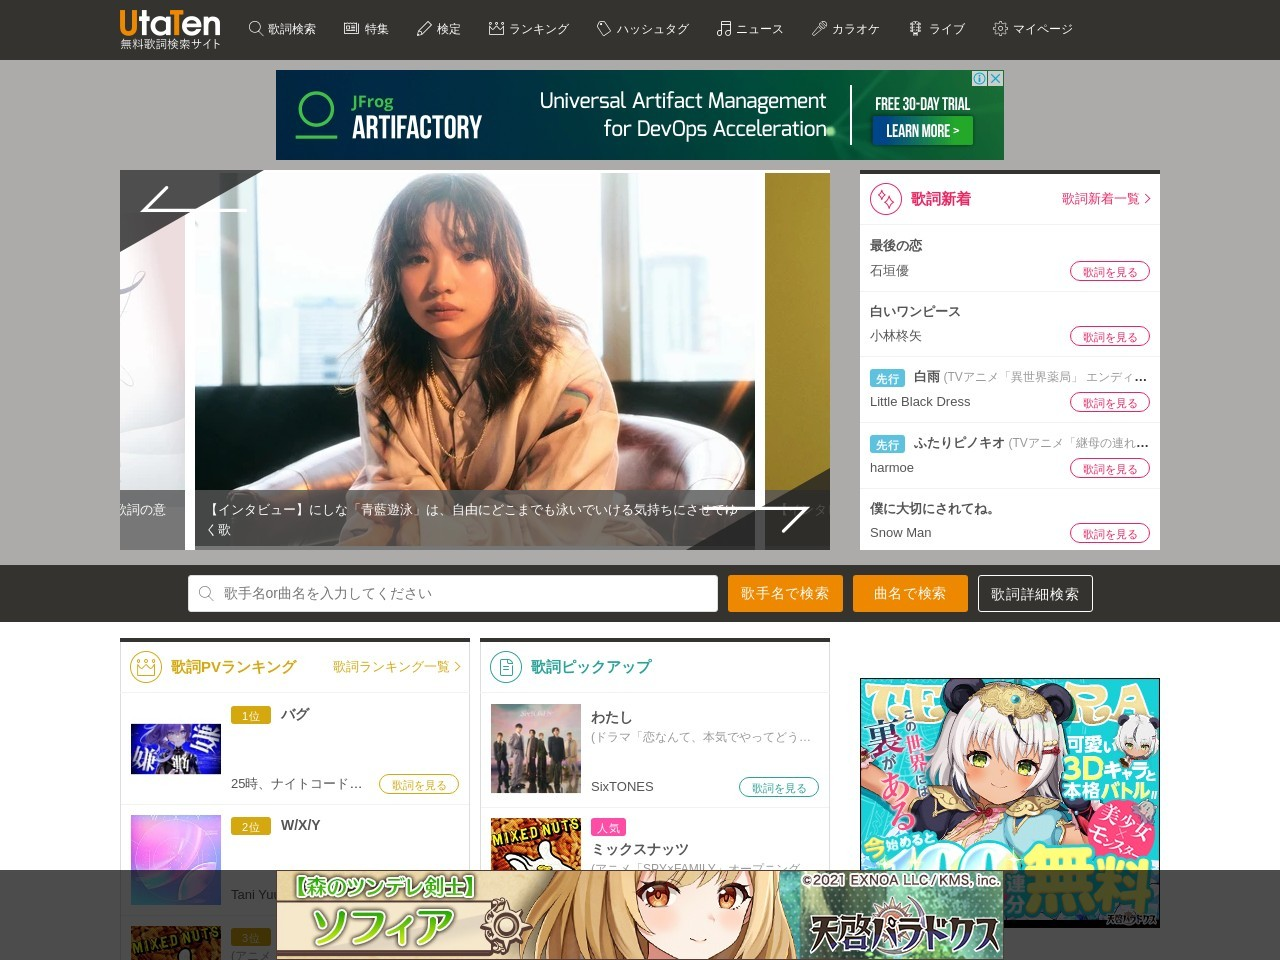 Automatic 歌詞「宇多田ヒカル」ふりがな付|歌詞検索サイト【UtaTen】